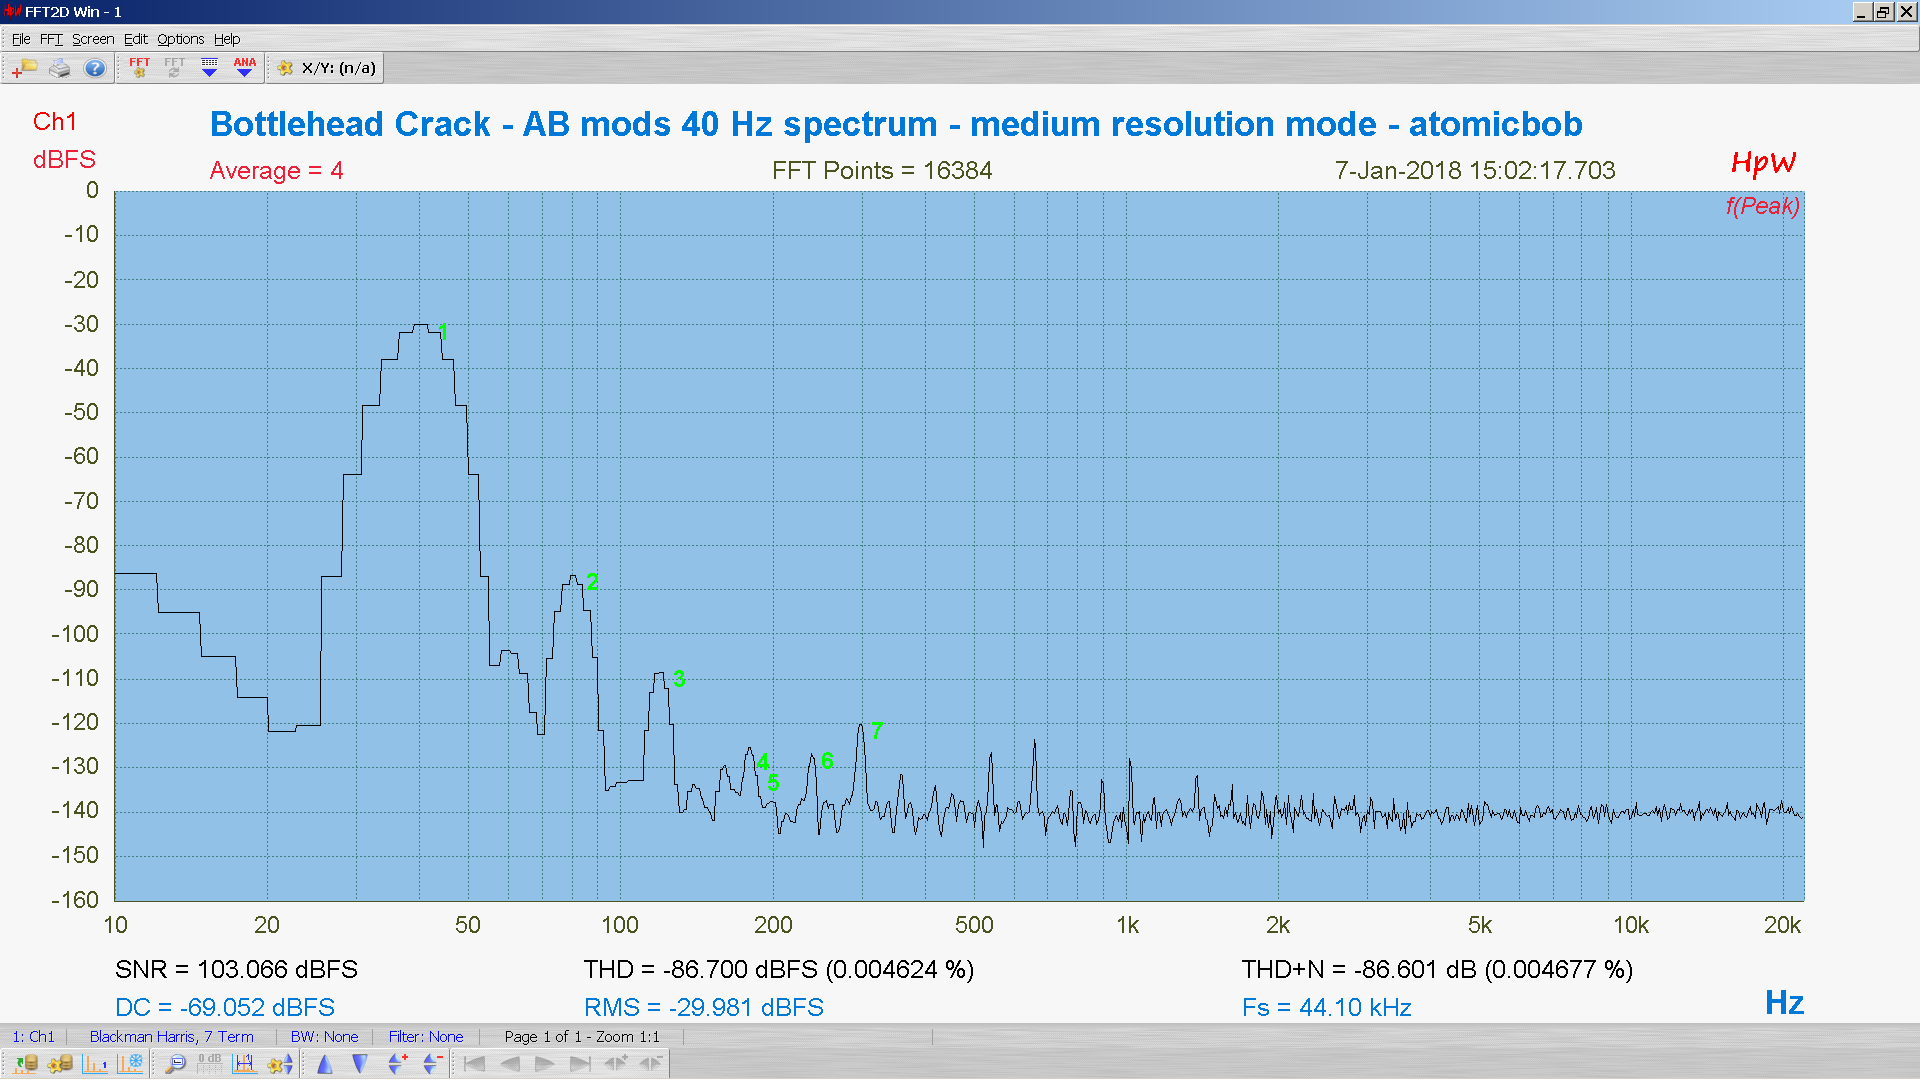 20180107-21 BH Crack e80cc 5998 40 Hz THD THD+N 16K FFT- ASIO -30 dBFS - HpW.PNG